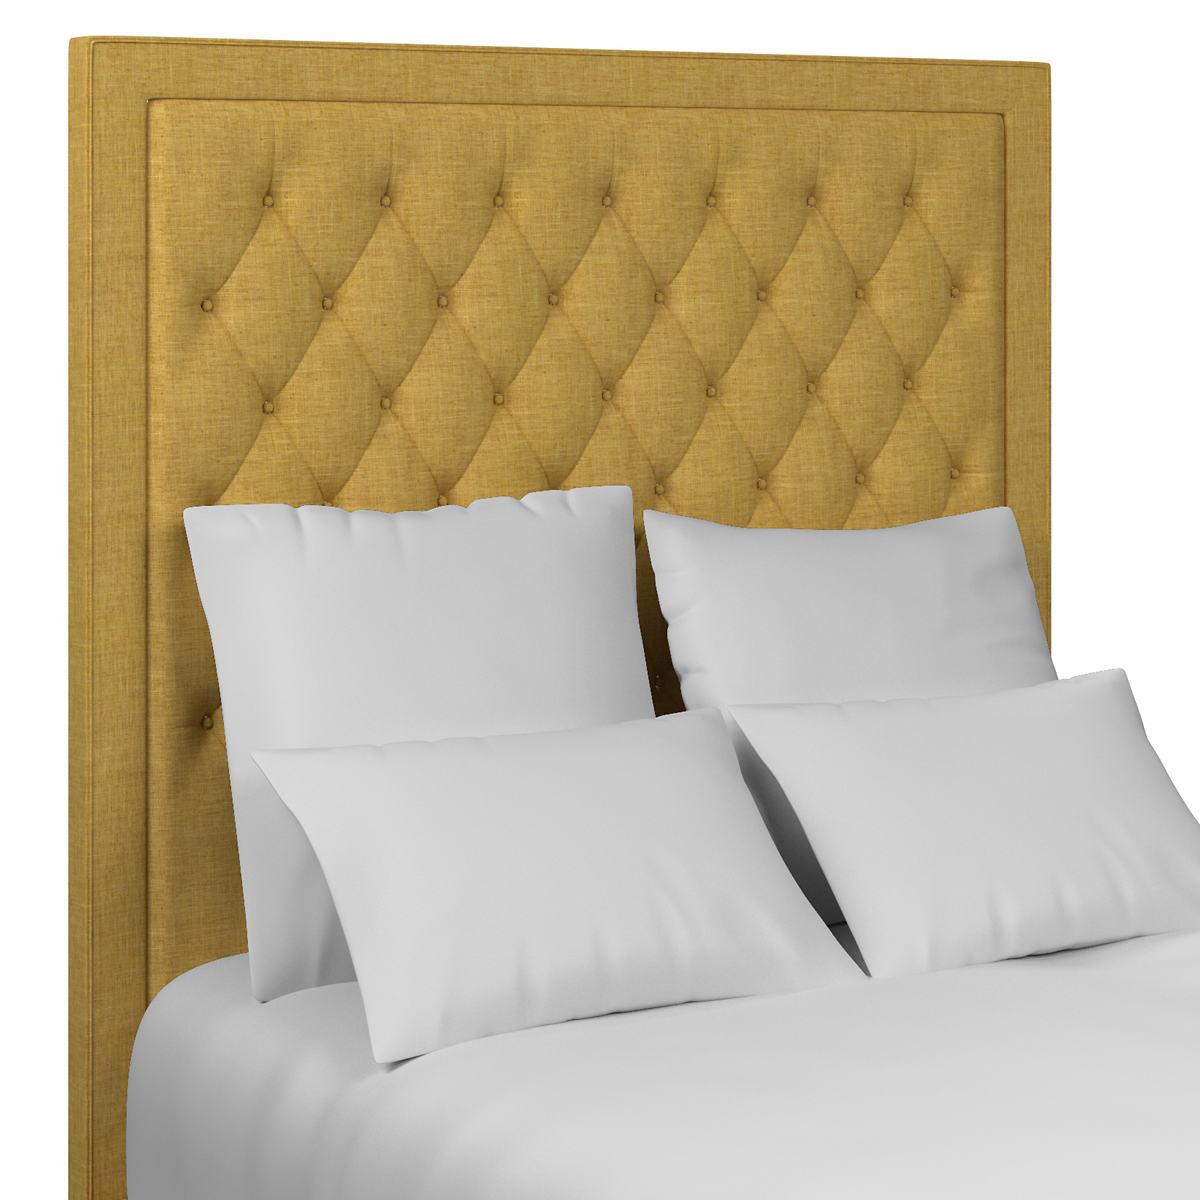 Greylock Gold Stonington Tufted Headboard